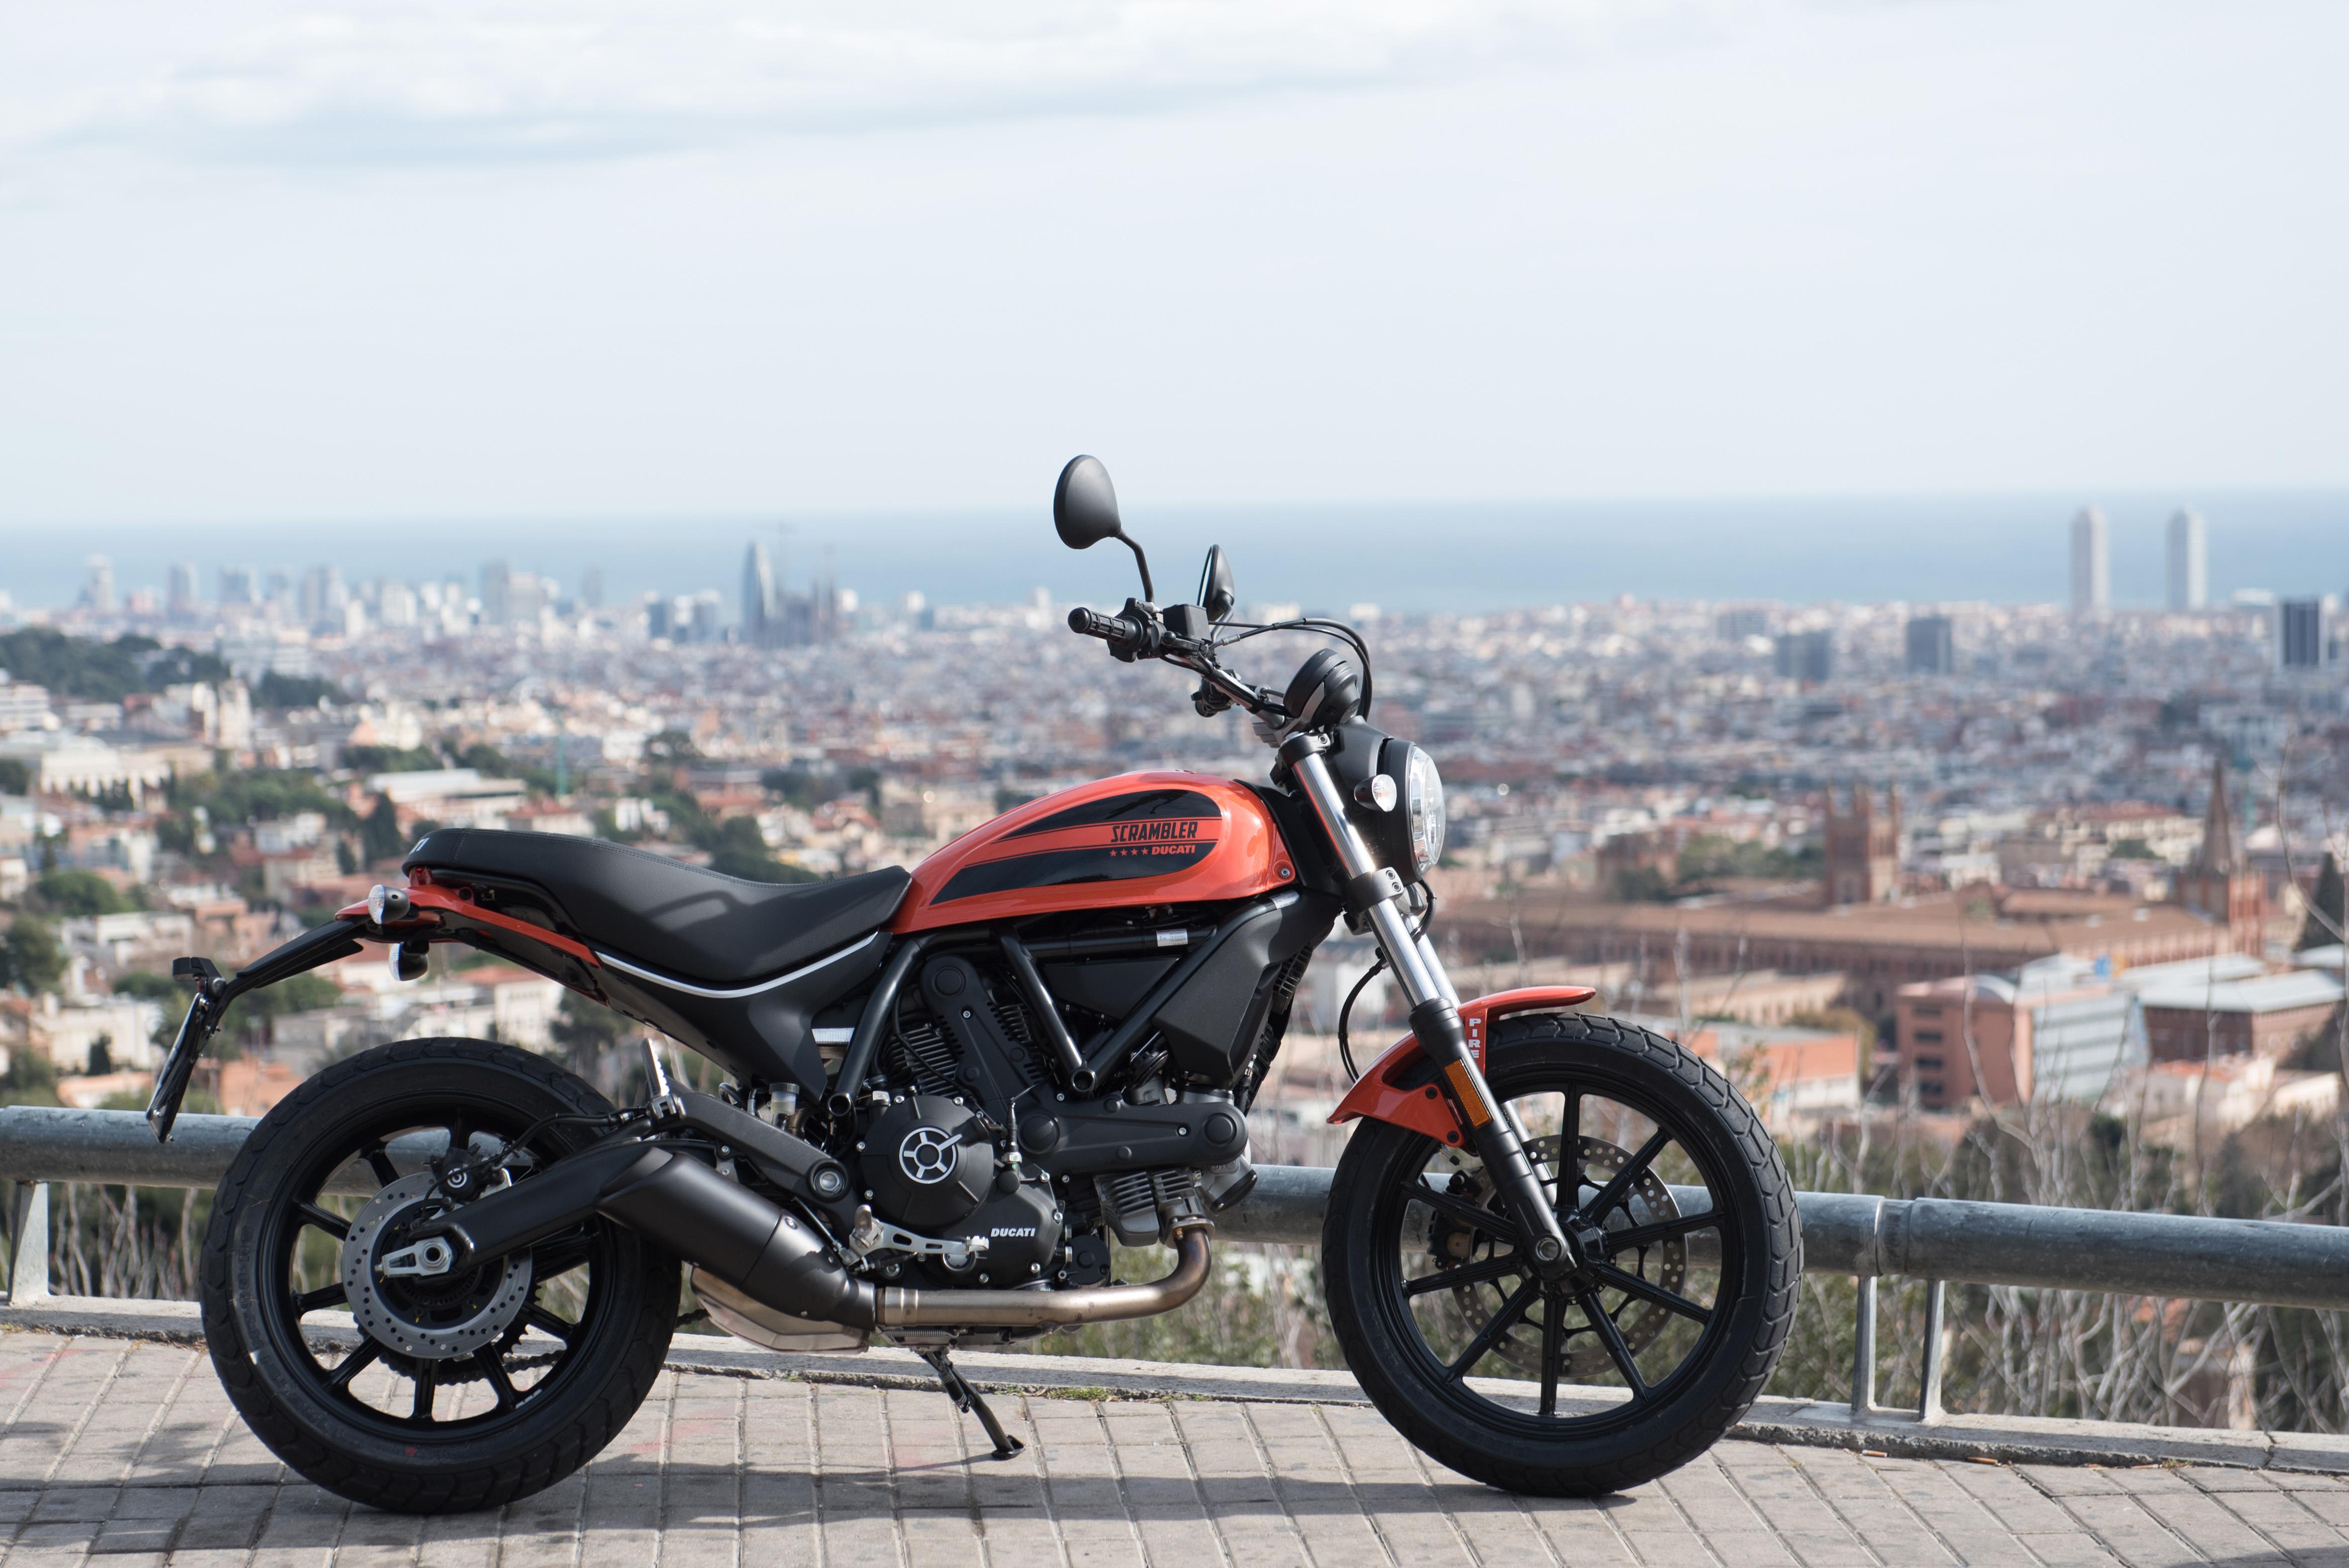 Ducati plans for supersize Scrambler